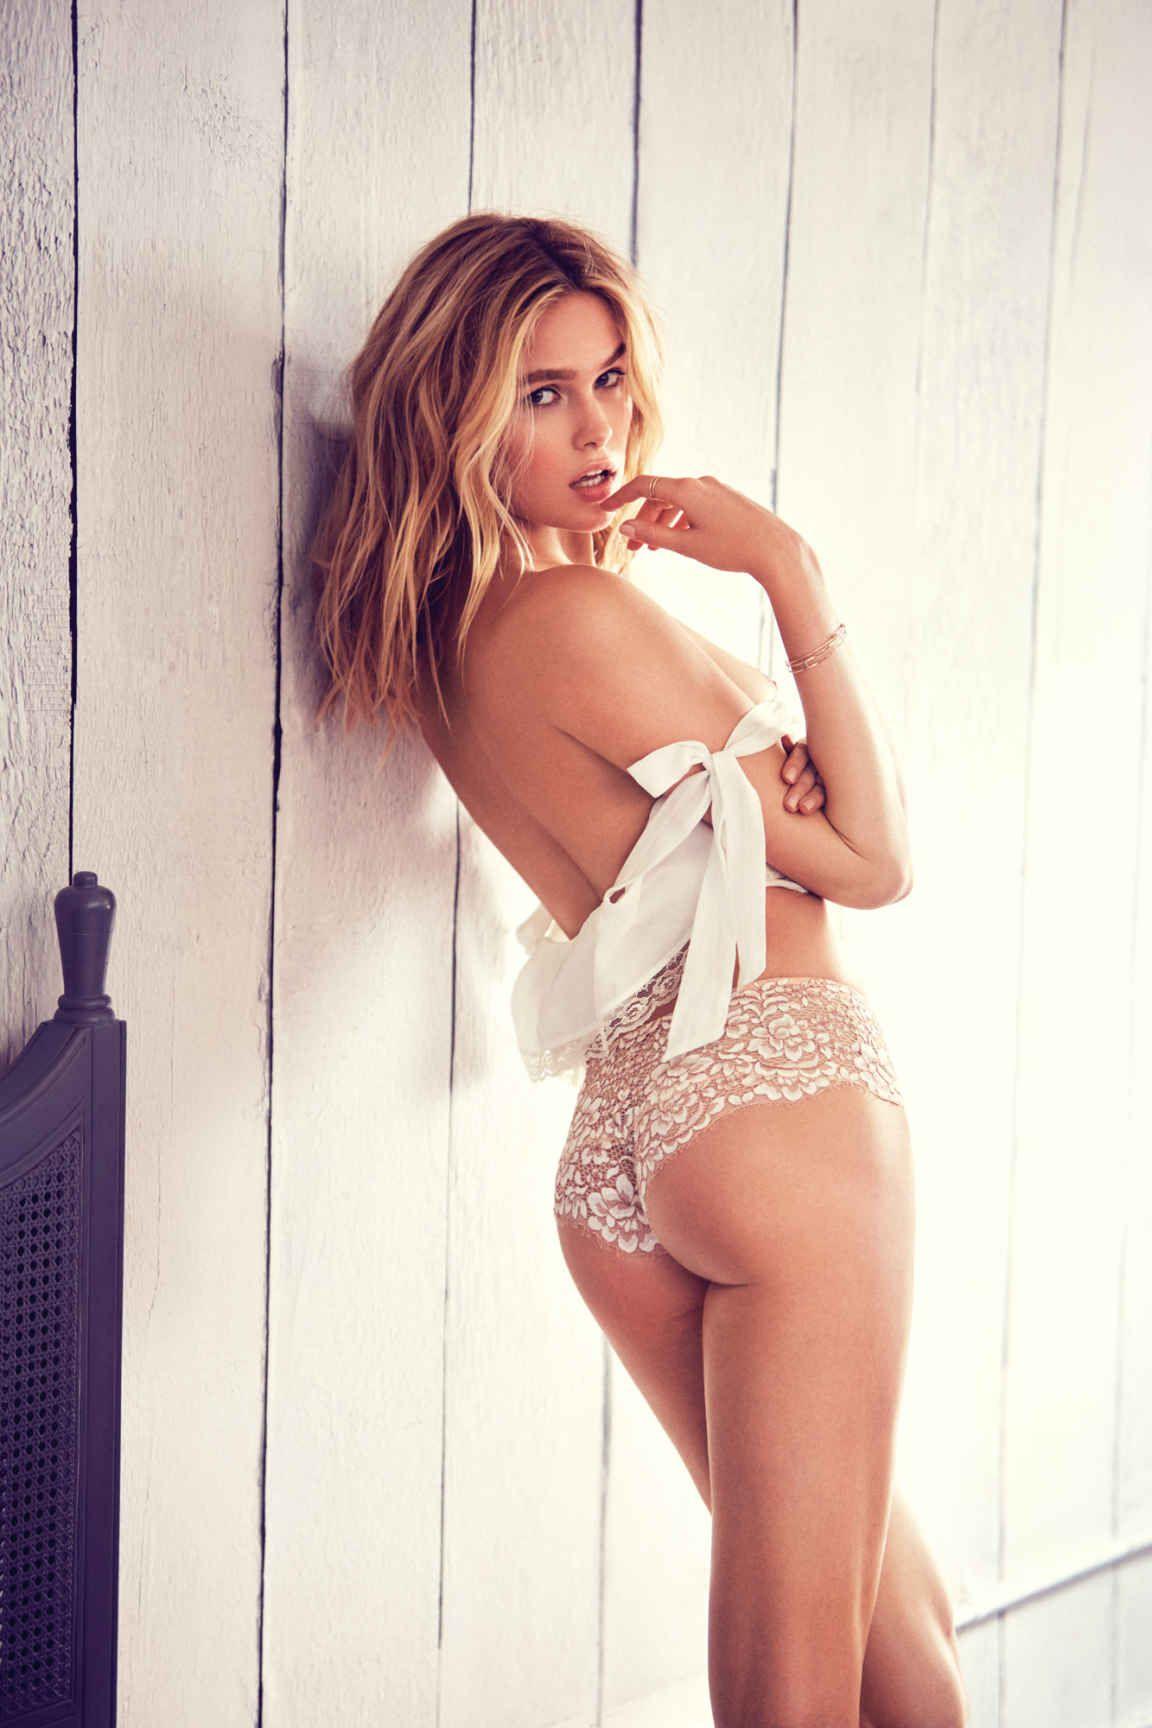 Tits Lada Kravchenko nudes (33 images) Cleavage, Twitter, legs